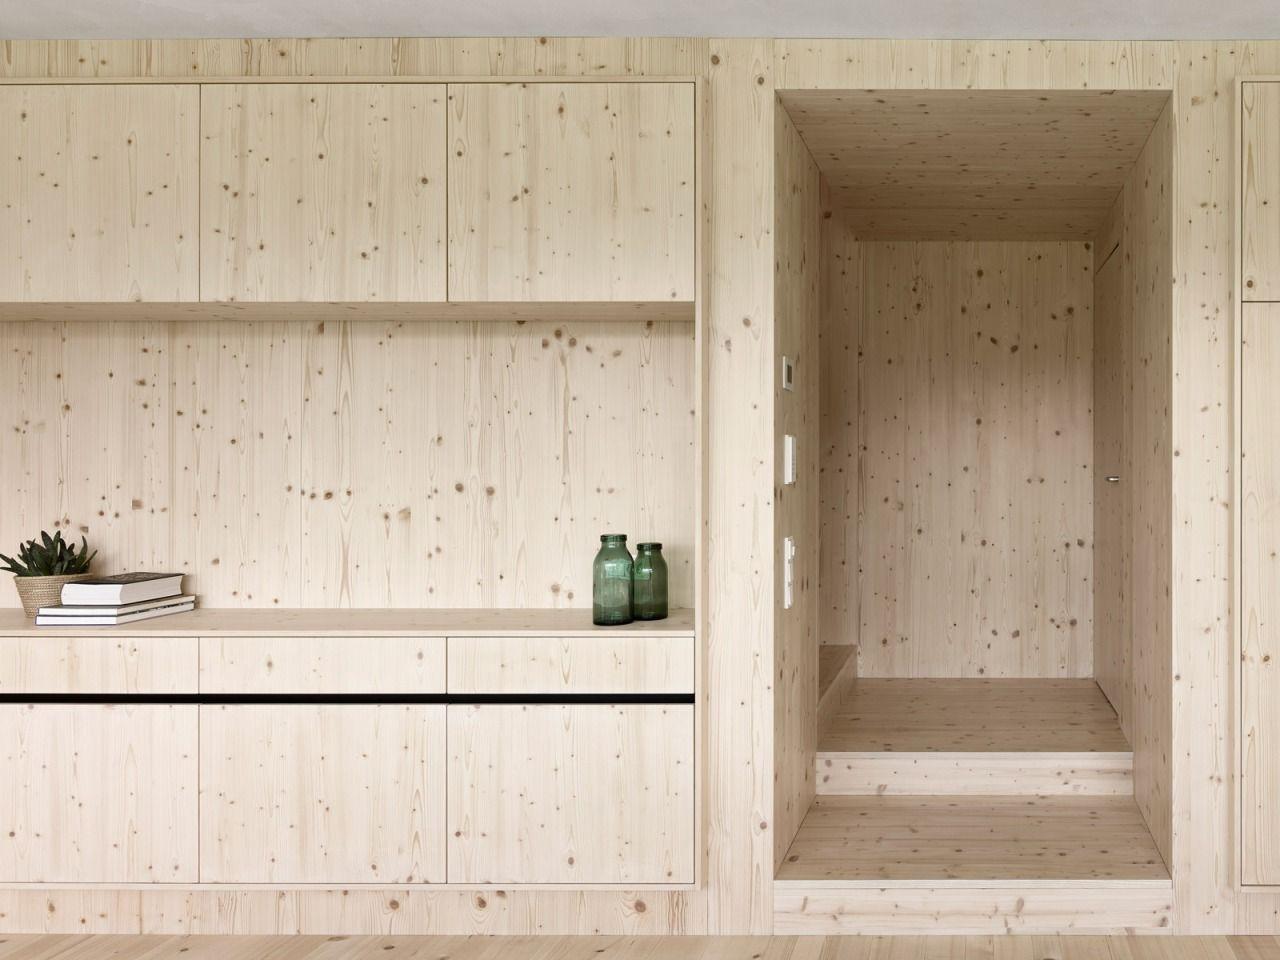 Innauer Matt - House for Julia & Bjorn, Egg 2013. Photos (C) Adolf Bereuter.